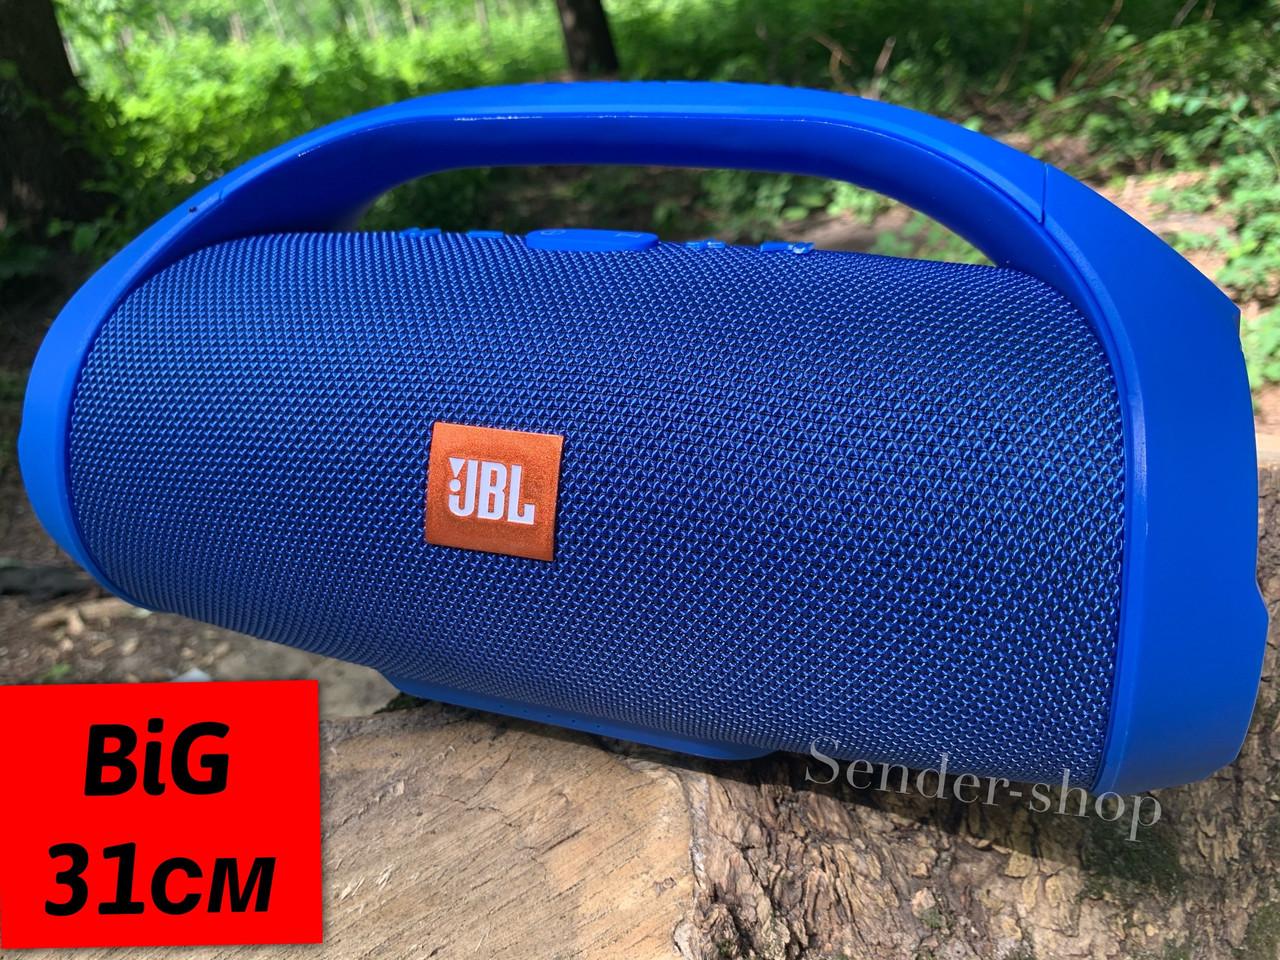 JBL Boombox XXL 40 Вт БУМБОКС Великий Синій